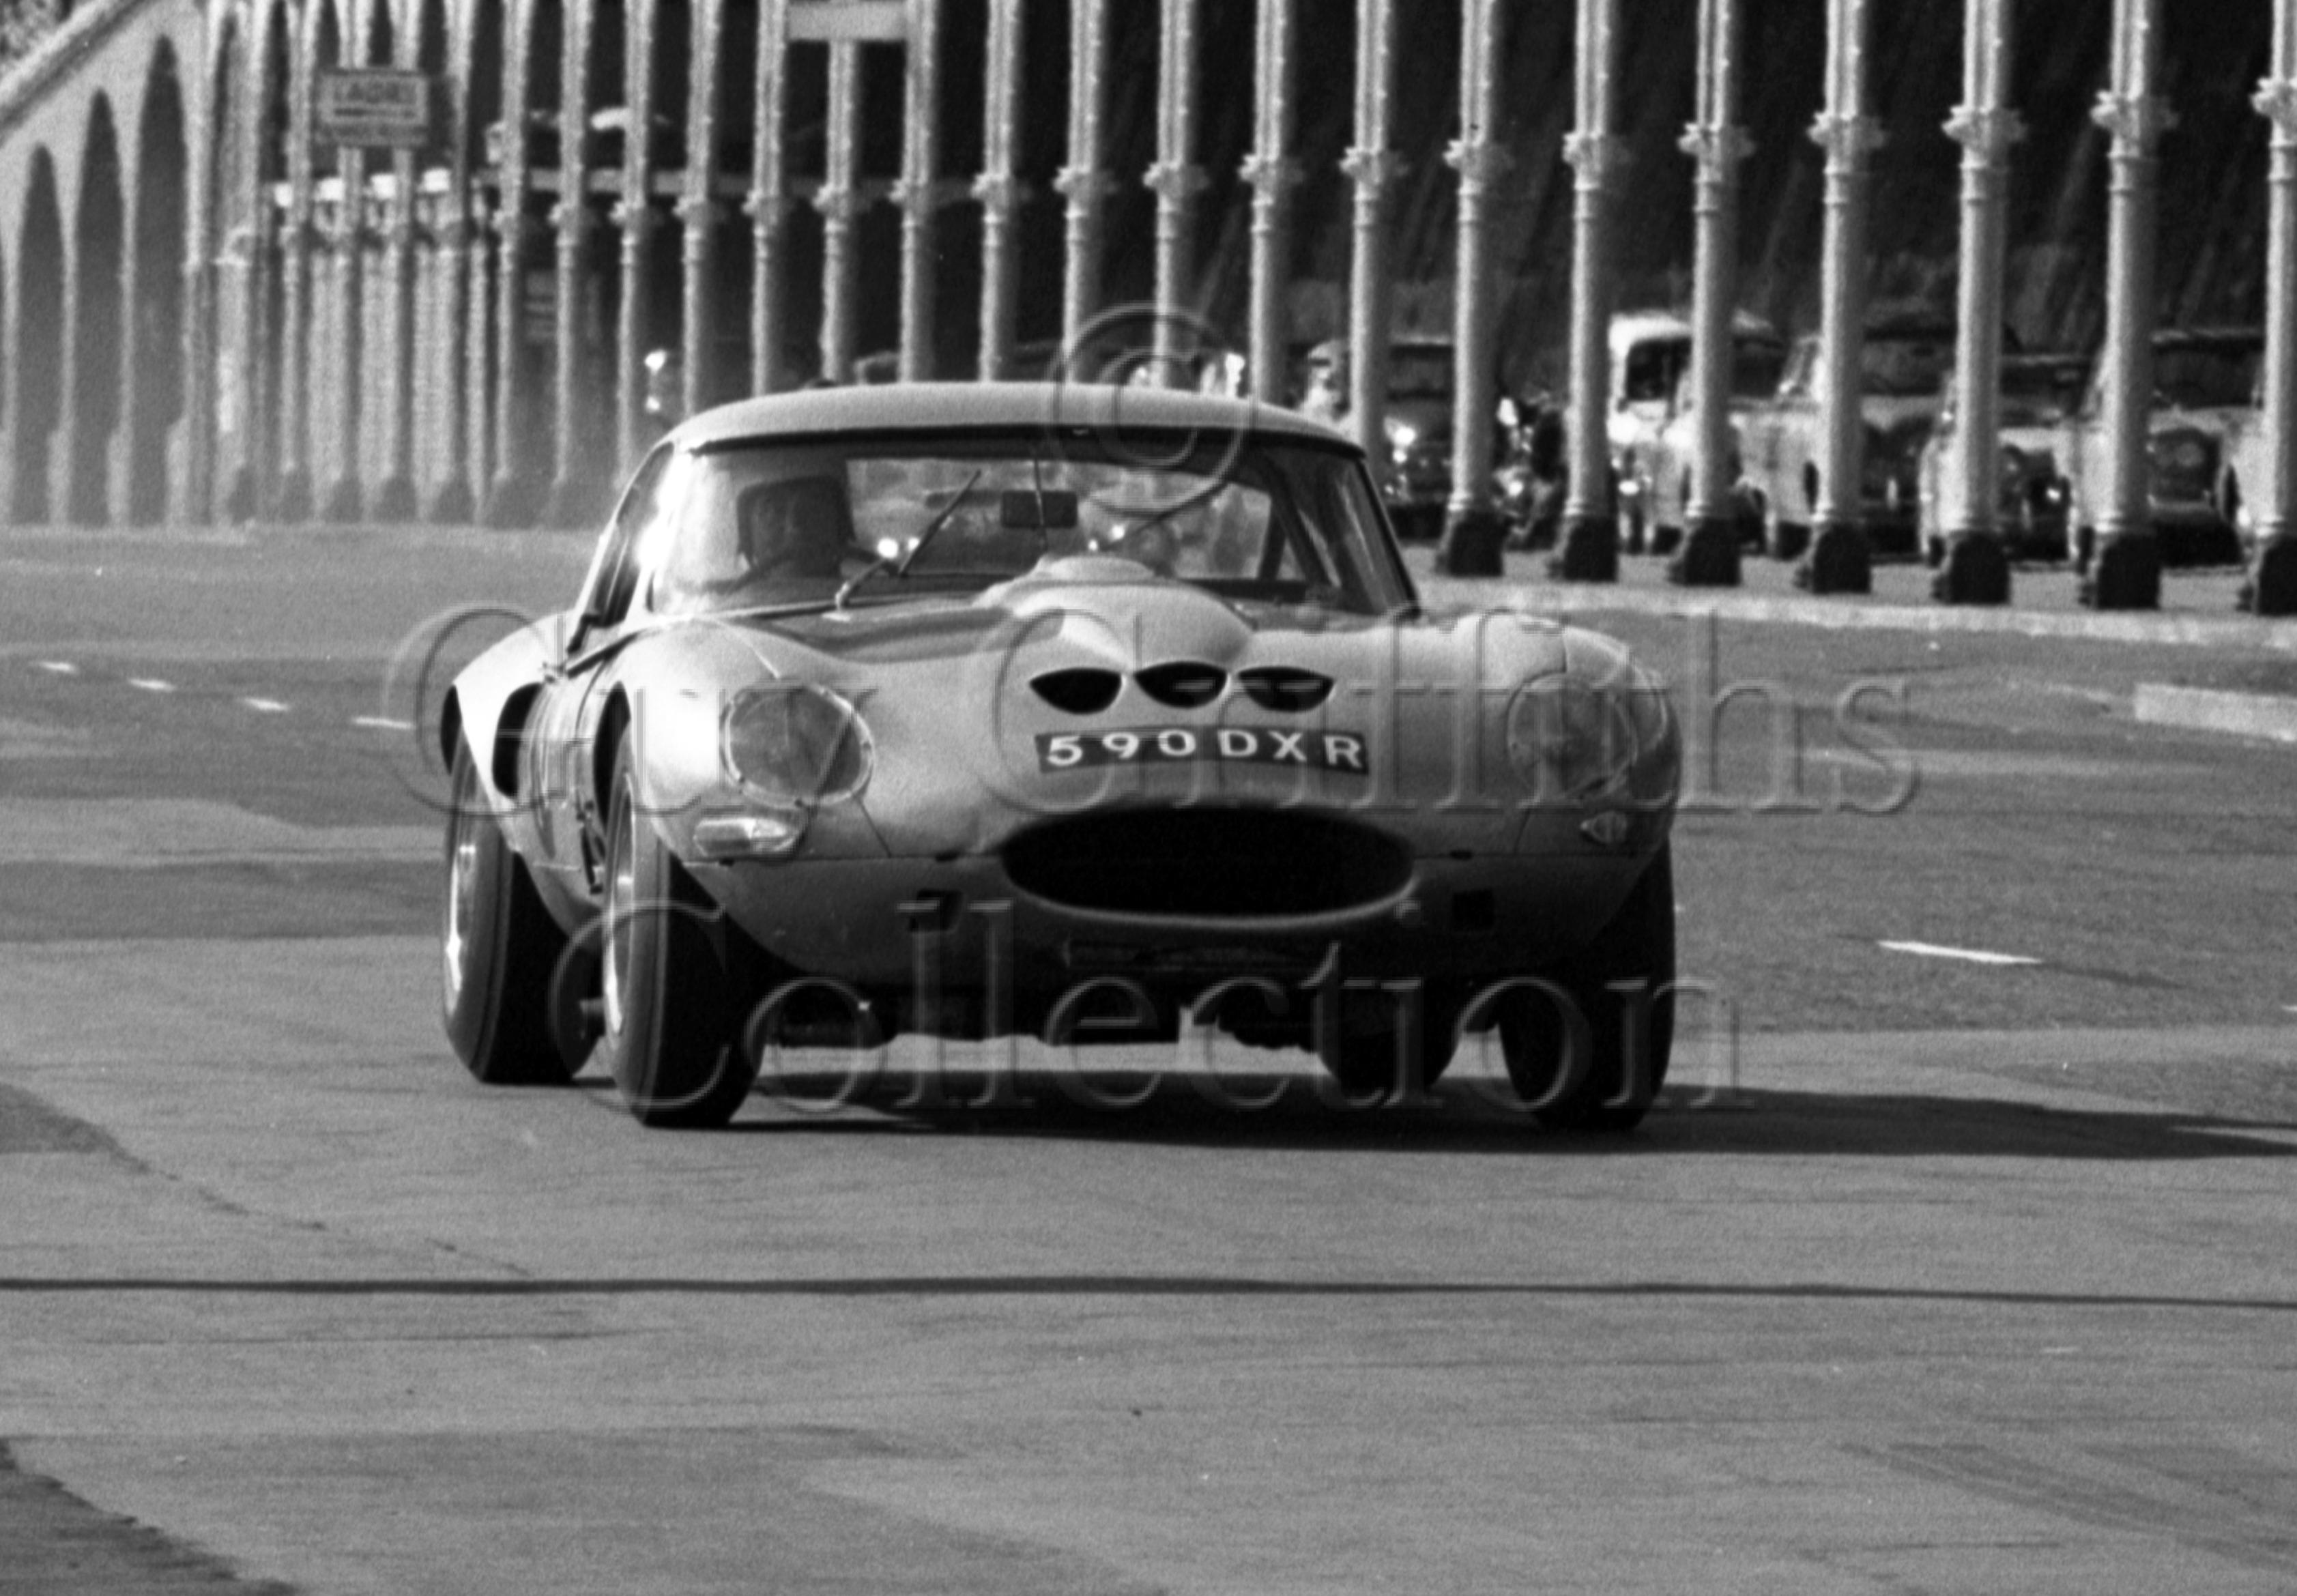 103-174–R-B-Beck–Jaguar-Egal-590-DXR–Brighton–17-09-1966.jpg - Guy Griffiths Collection